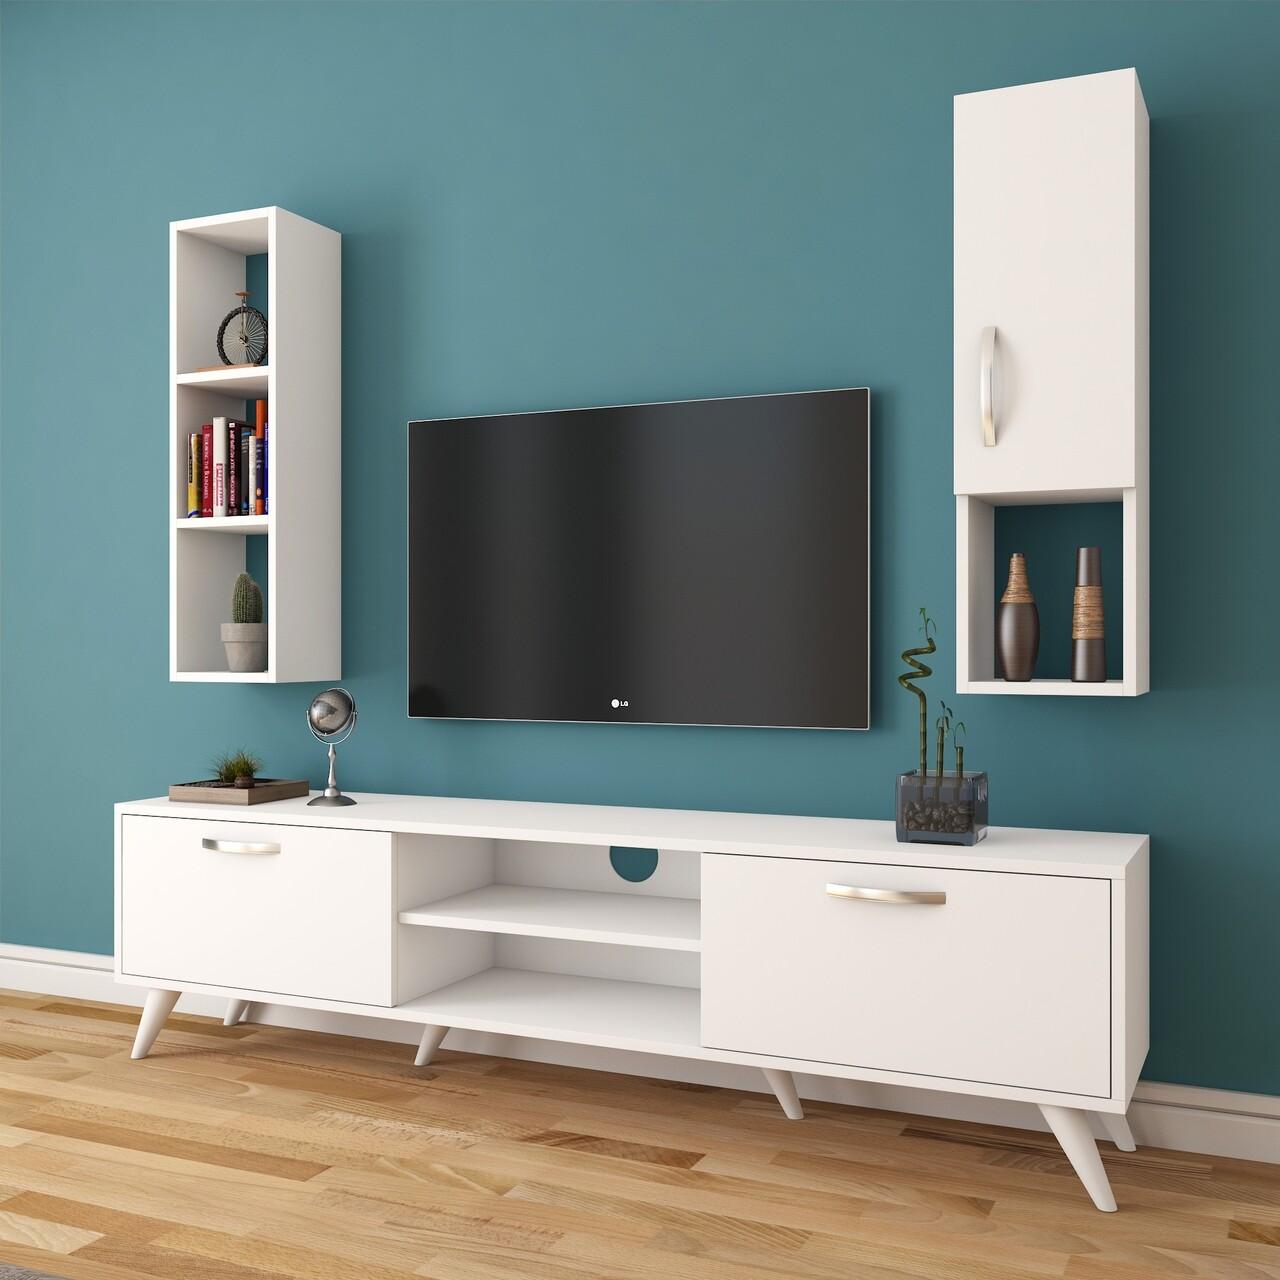 Comoda TV cu raft de perete si cabinet M11 - 251, Wren, 180 x 35 x 48.6 cm/90 cm, white